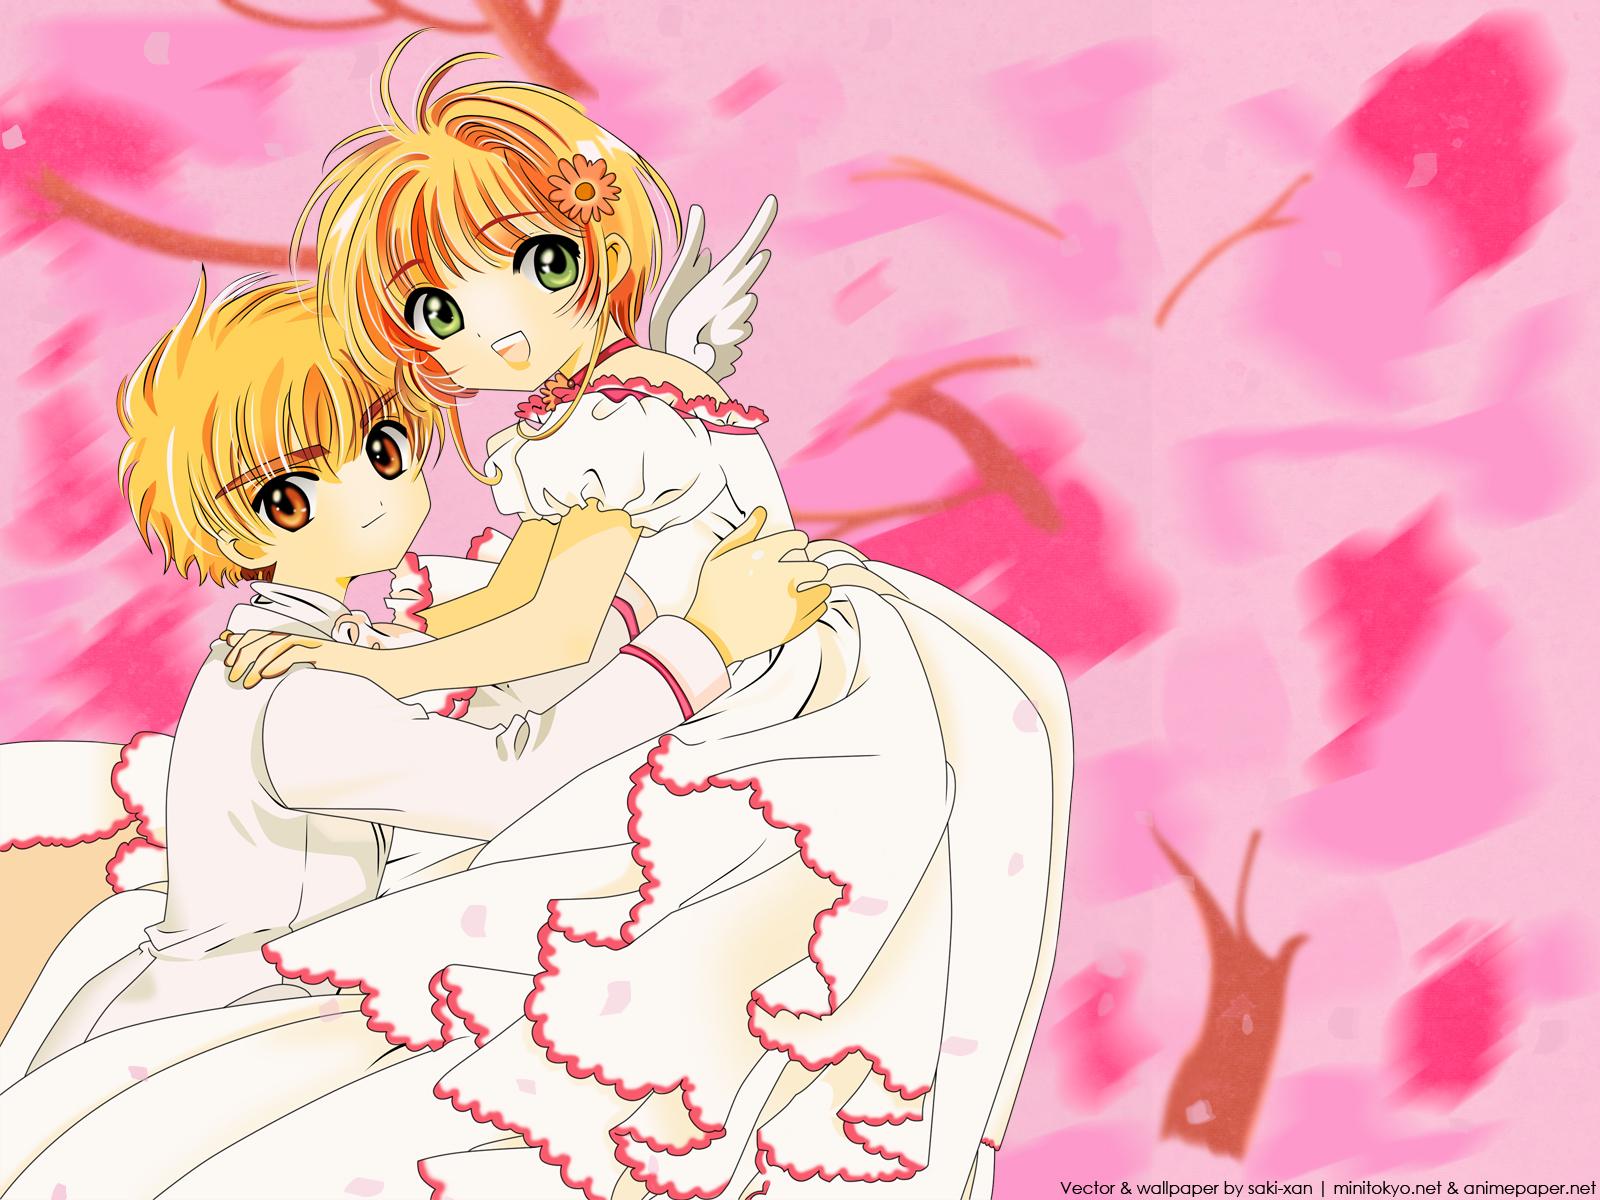 Cardcaptor sakura wallpaper your sakura world minitokyo - Cardcaptor sakura wallpaper ...